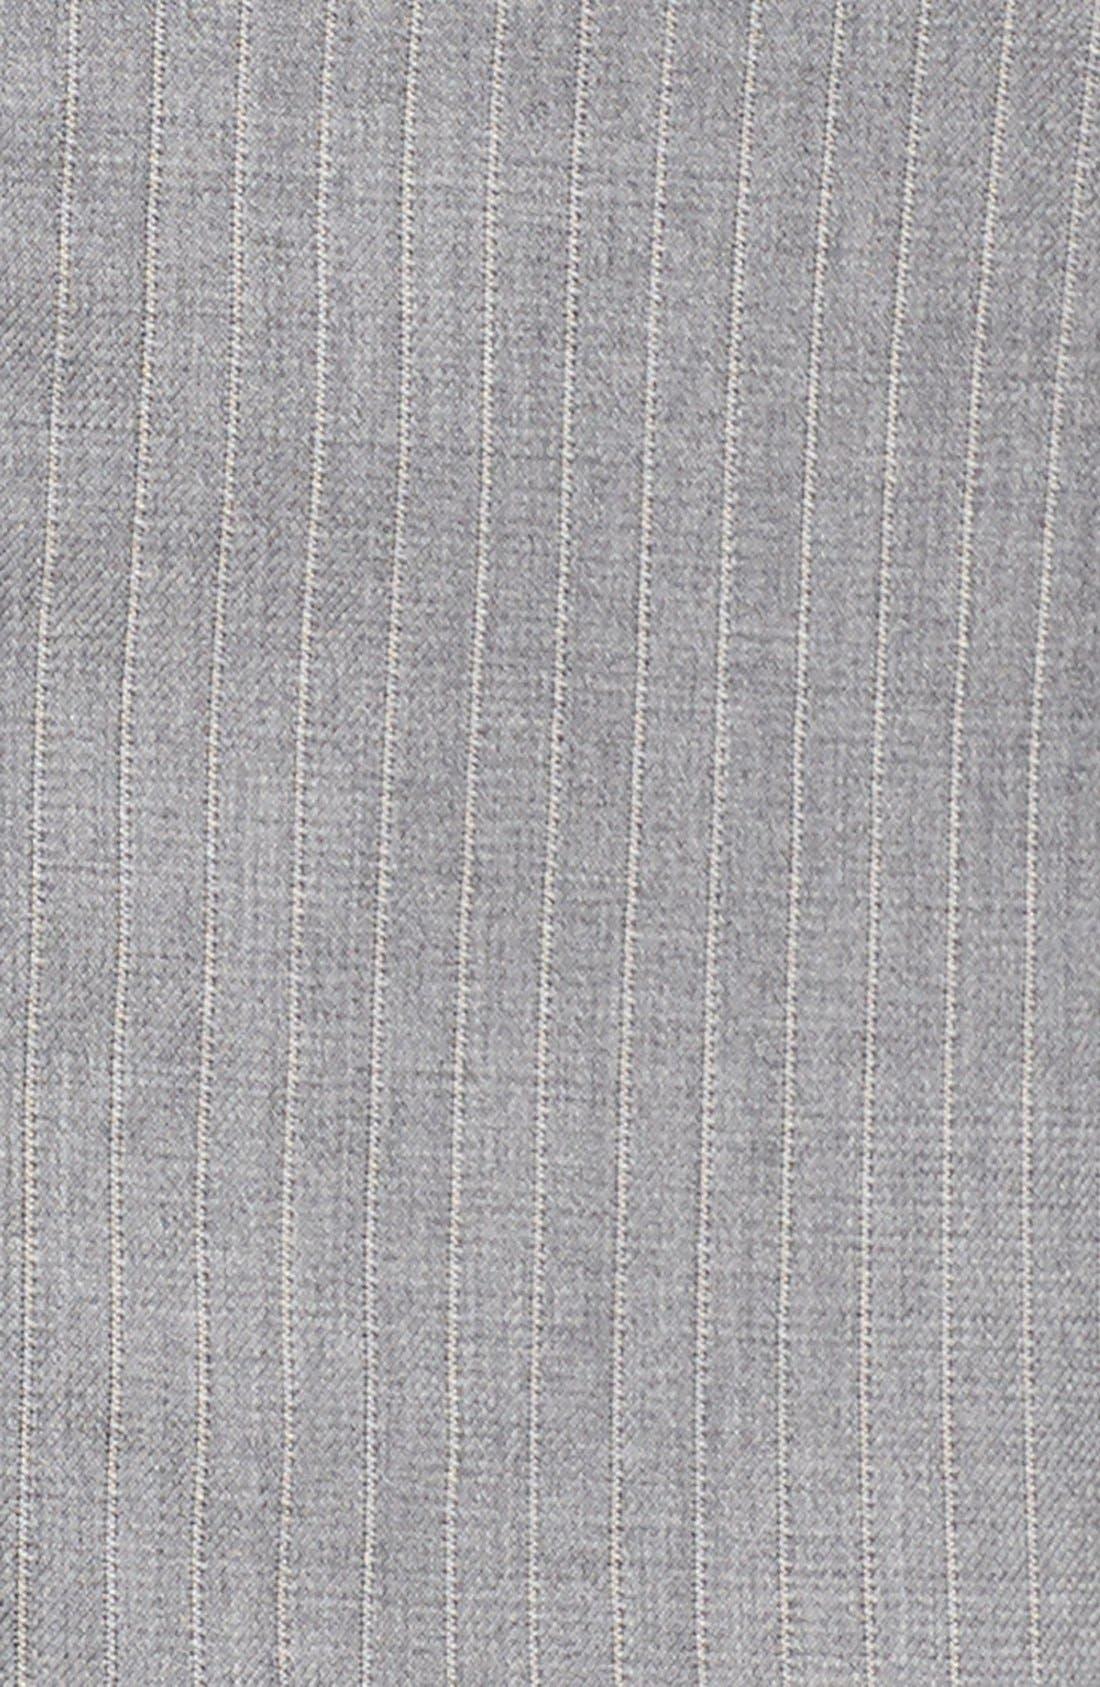 'Jelenna' Pinstripe One-Button Suit Jacket,                             Alternate thumbnail 4, color,                             060